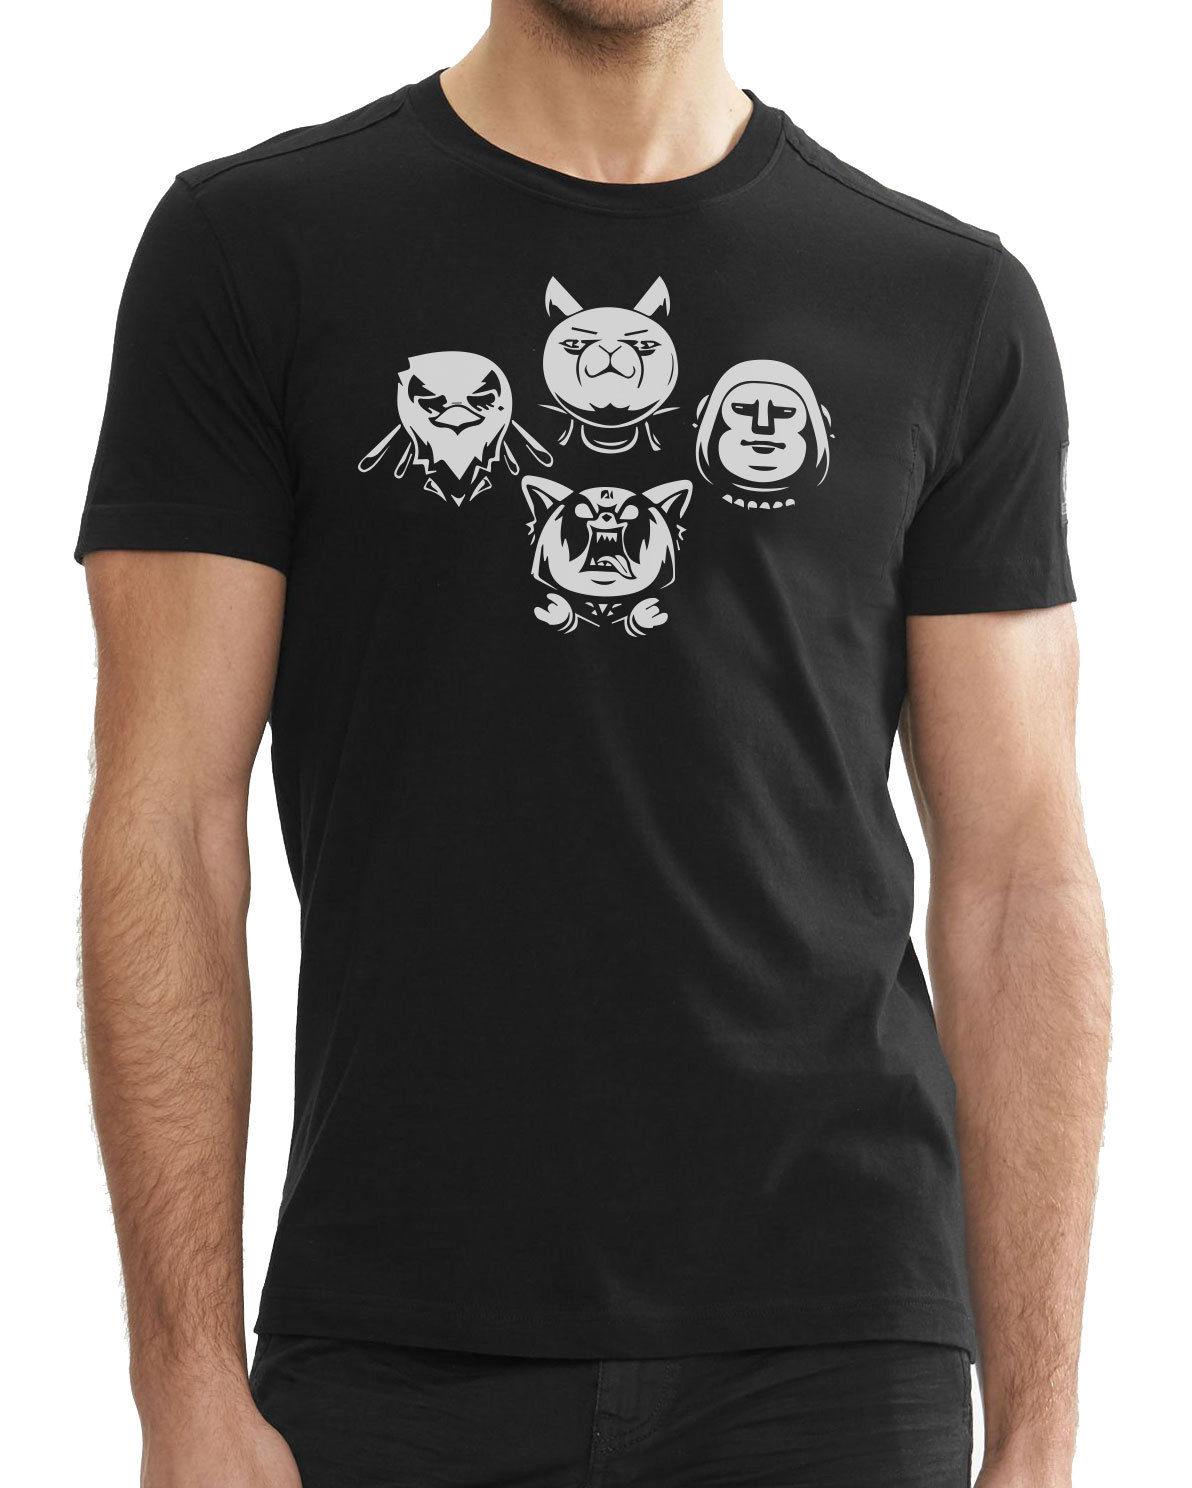 Aggretsuko Rhapsody T Shirt Design Your Own Shirt Red Panda Mens